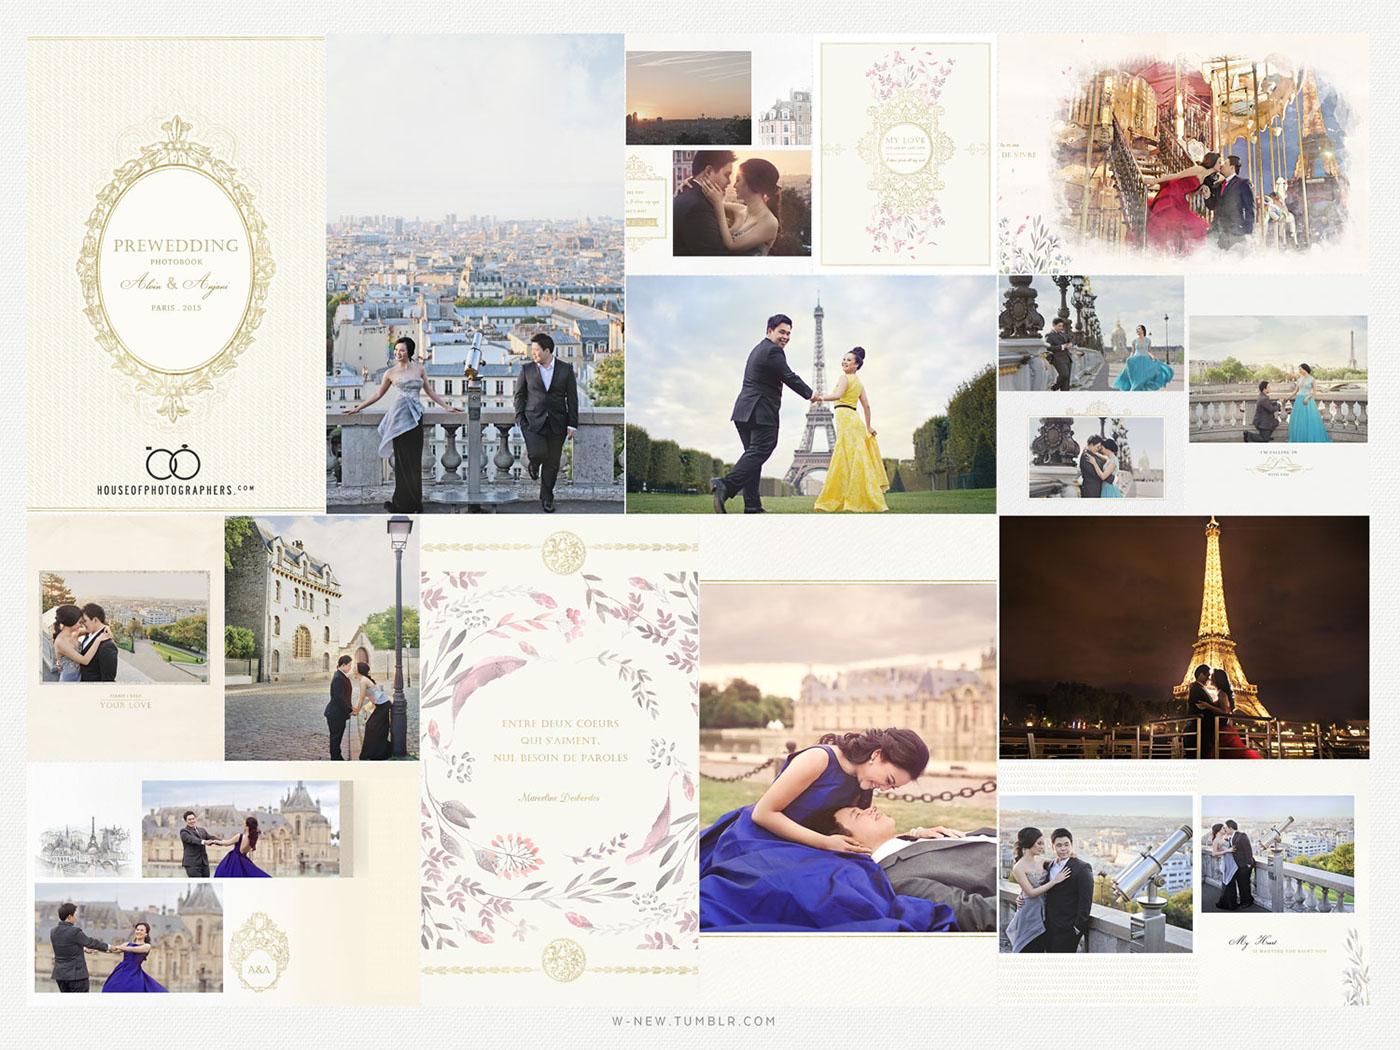 Prewedding Photobook Design, photo by HOP on Behance